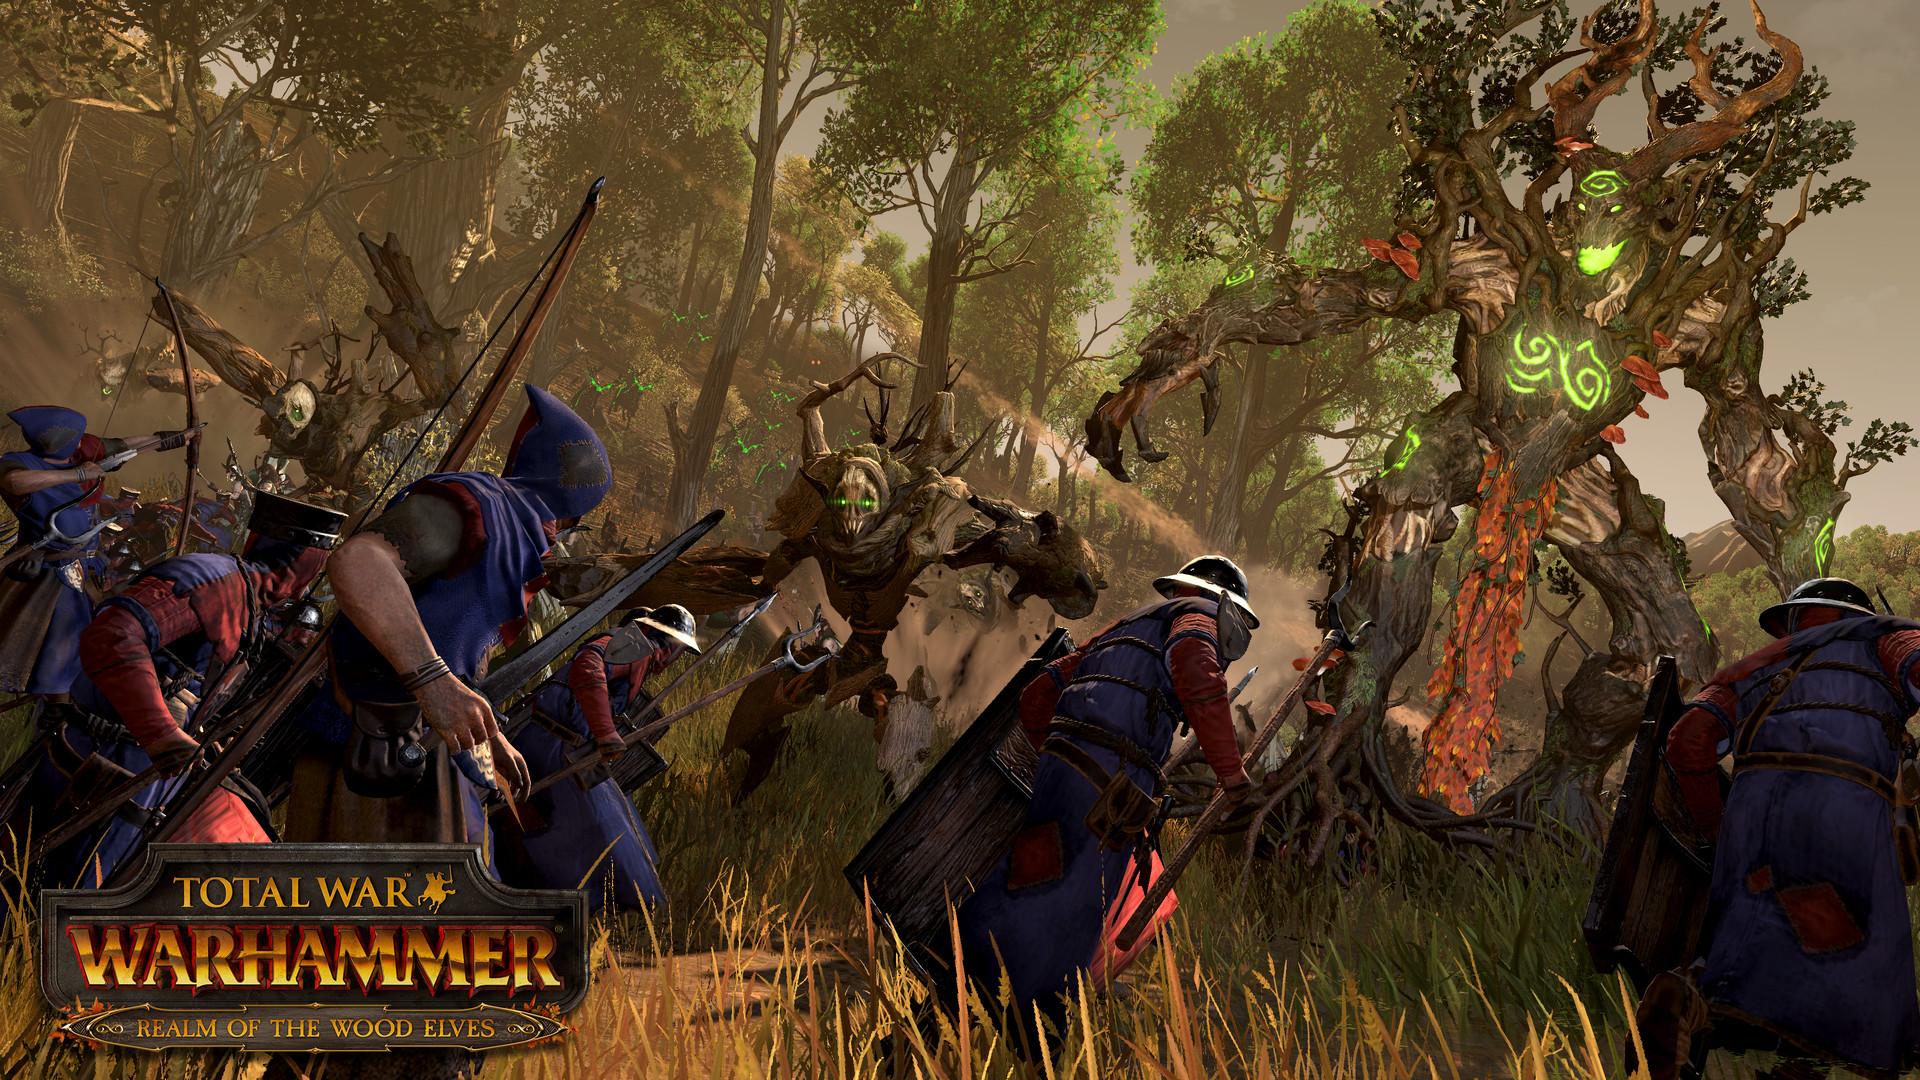 Warhammer Total War ! - Page 2 Ss_1543ab5ac9670546b75c39a0e0f93059b8bcb269.1920x1080